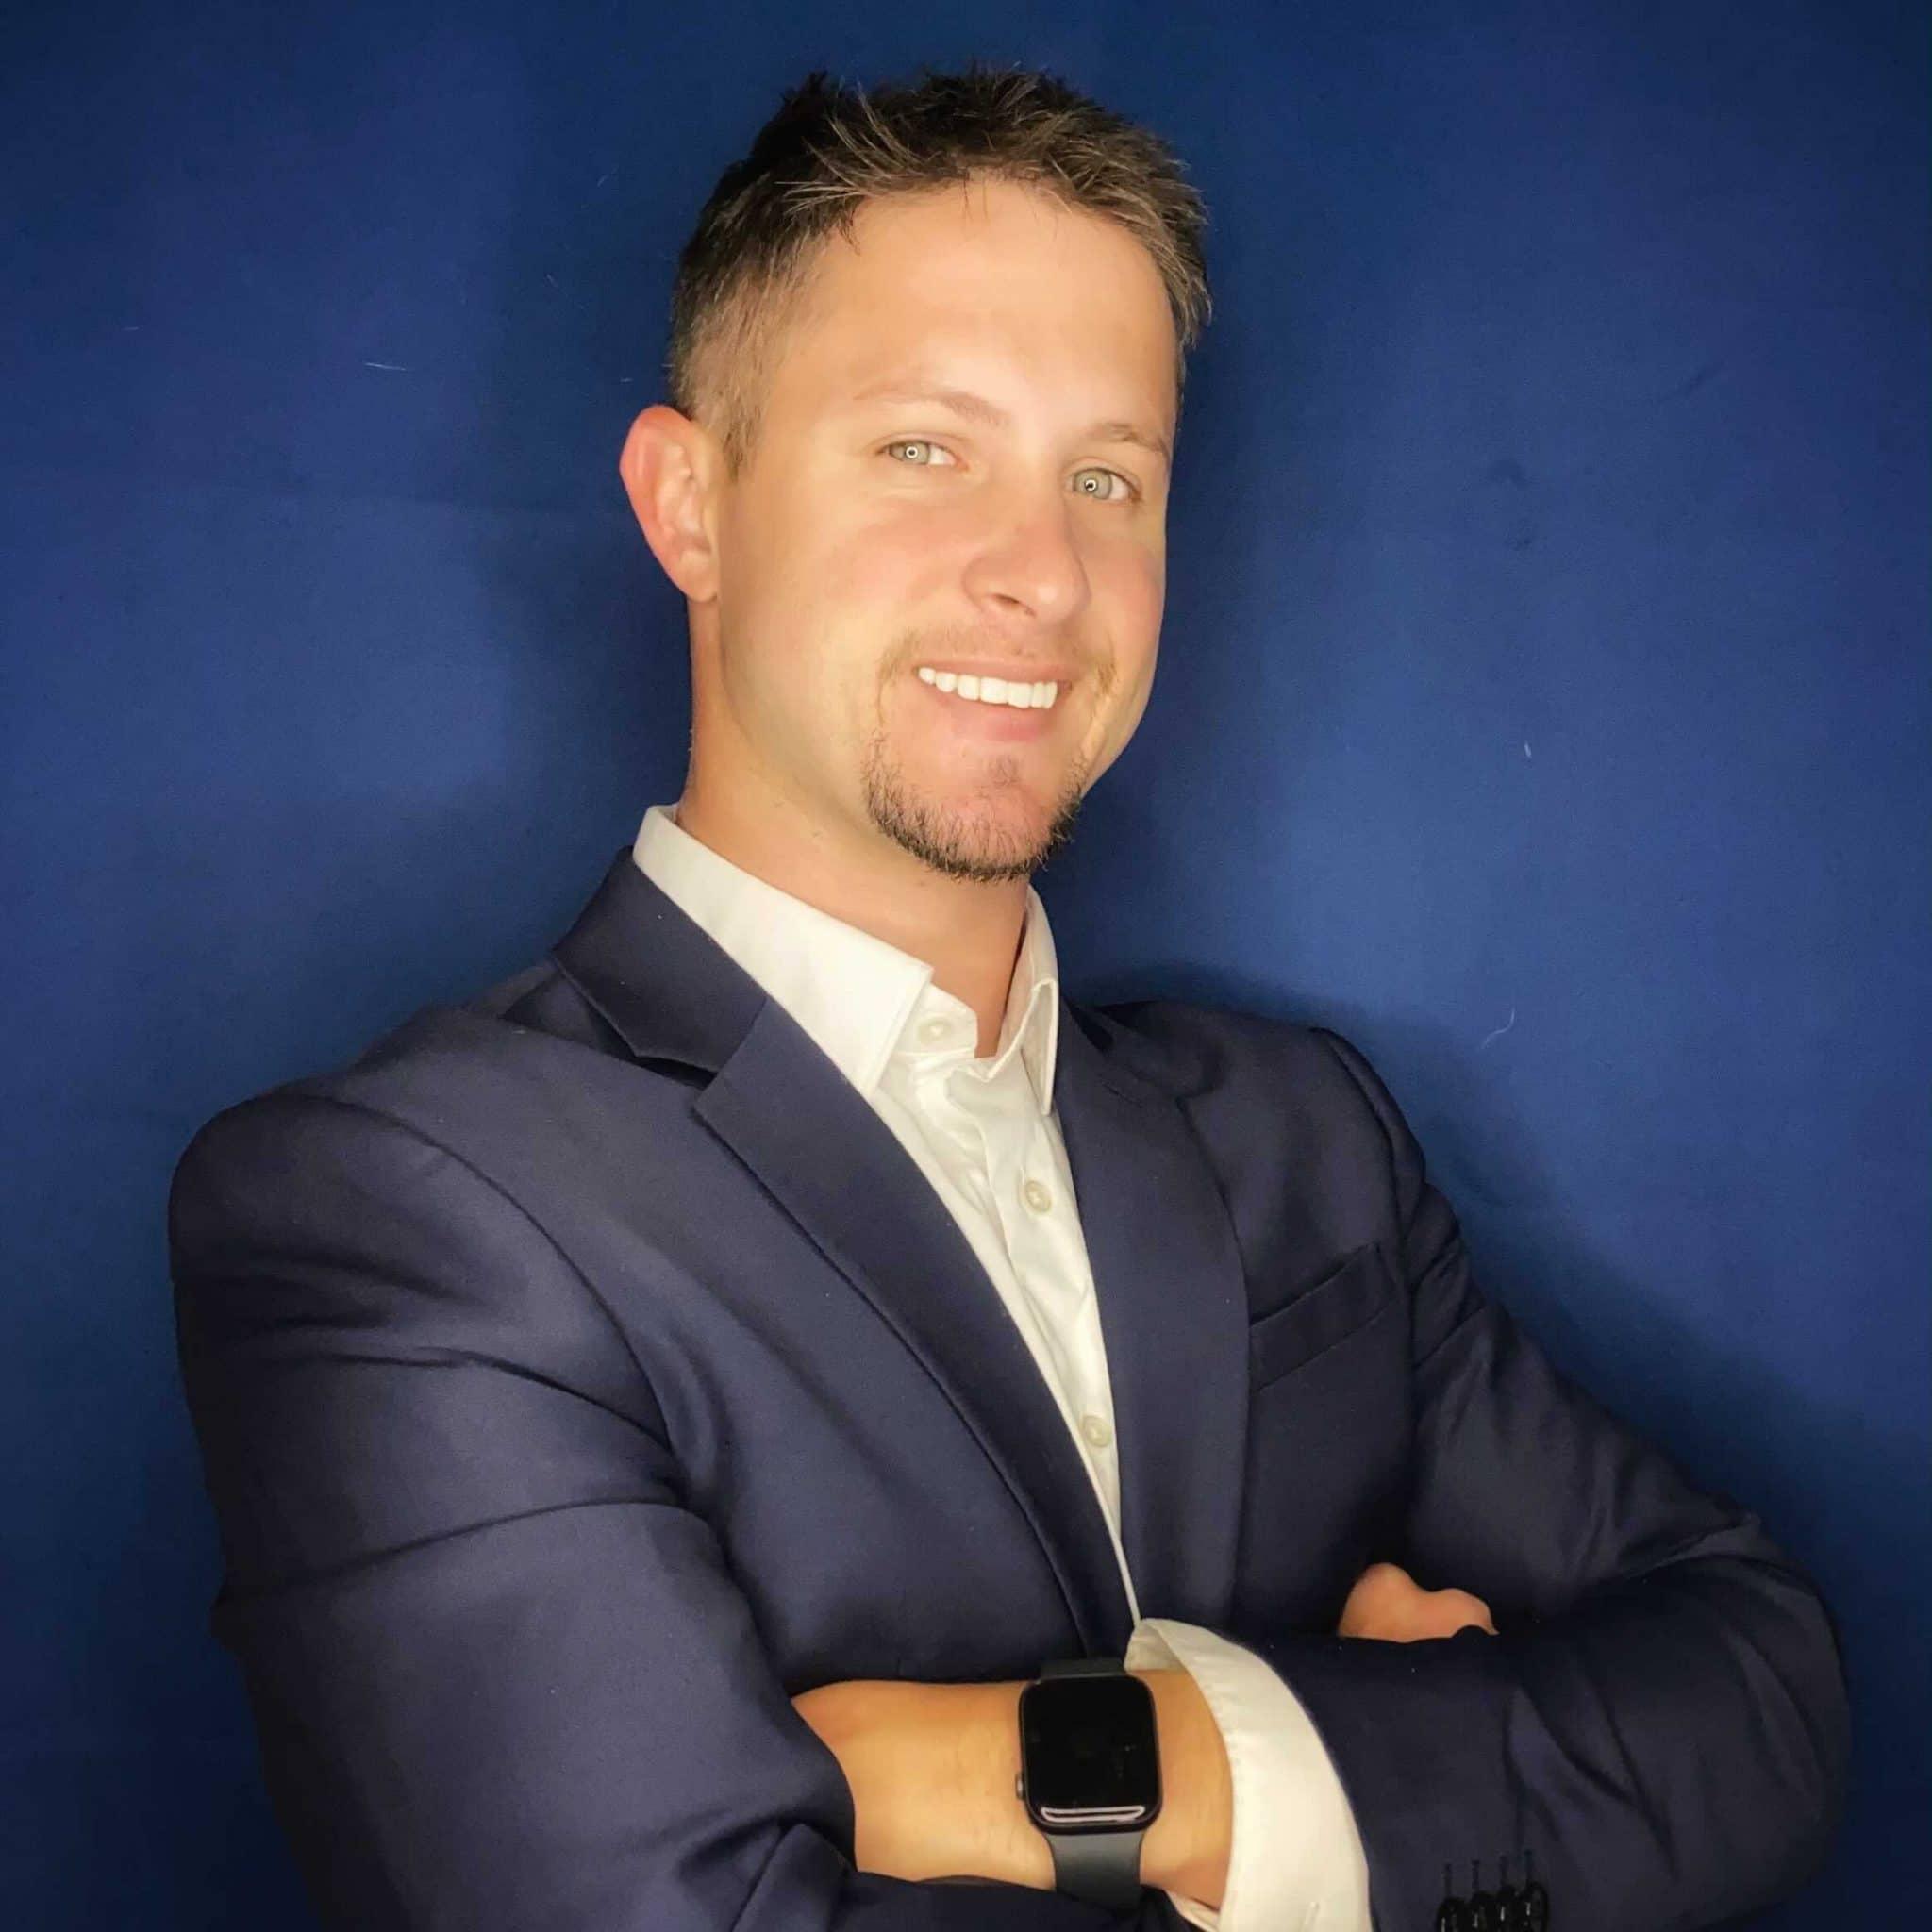 Braedon Kruse CEO at Sooner Marketing Solutions